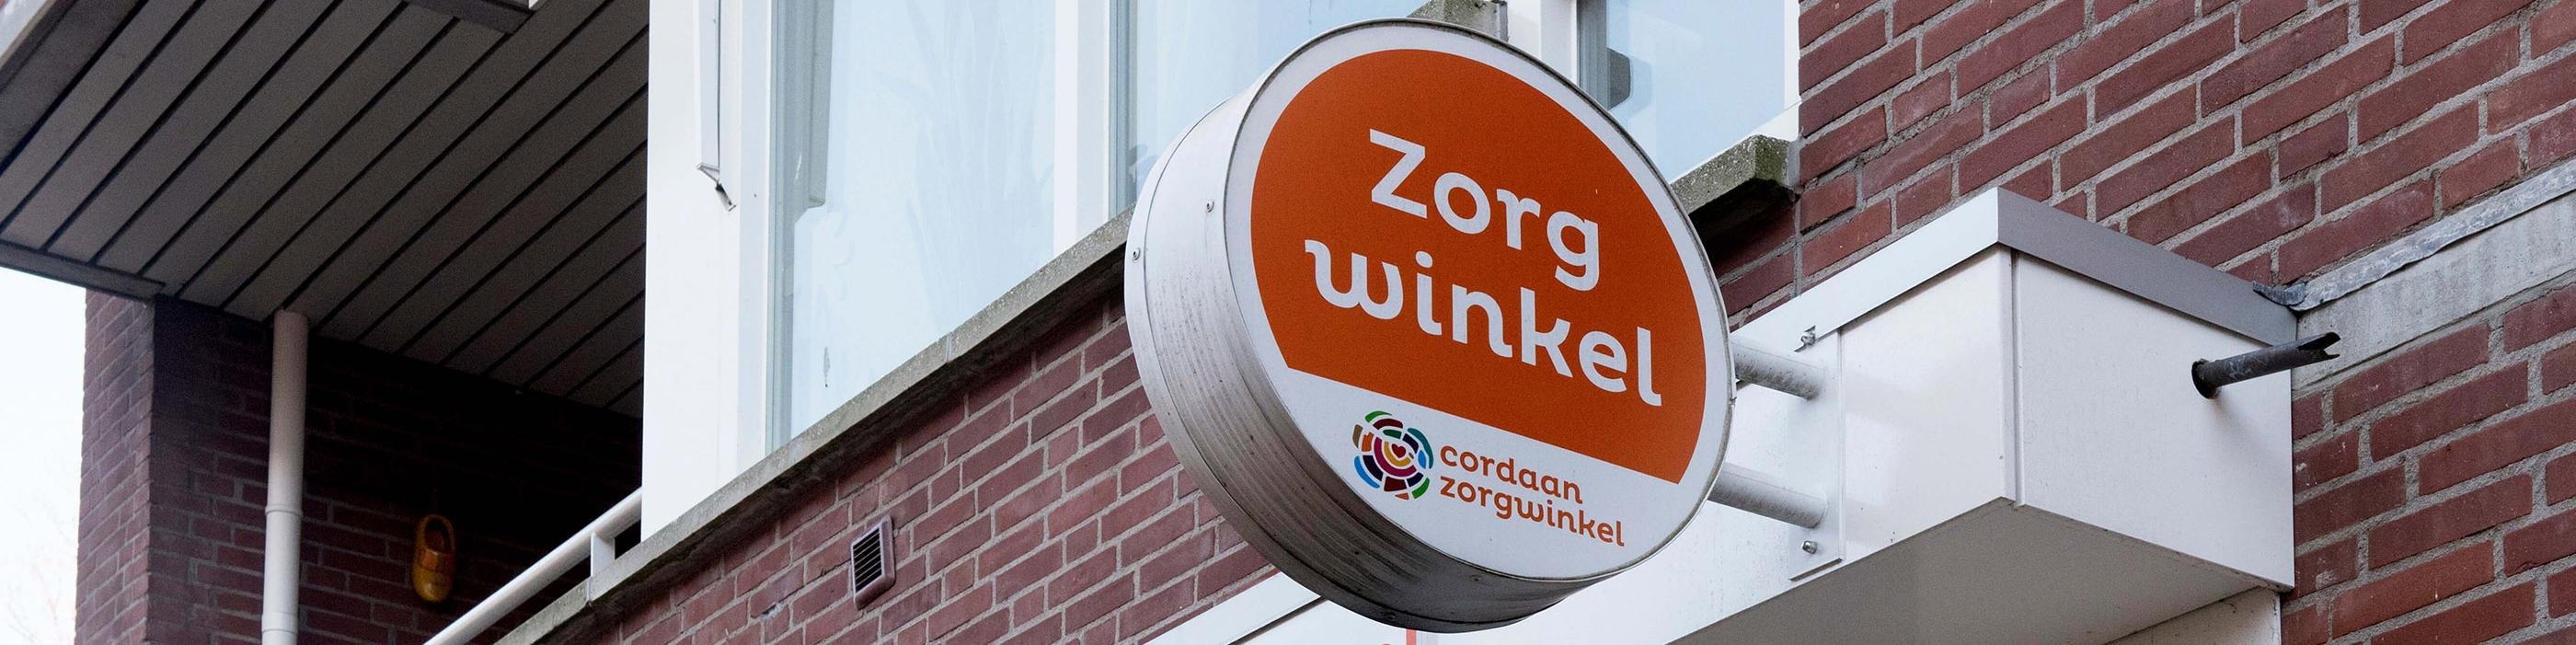 Zorgwinkel A.J. Ernststraat